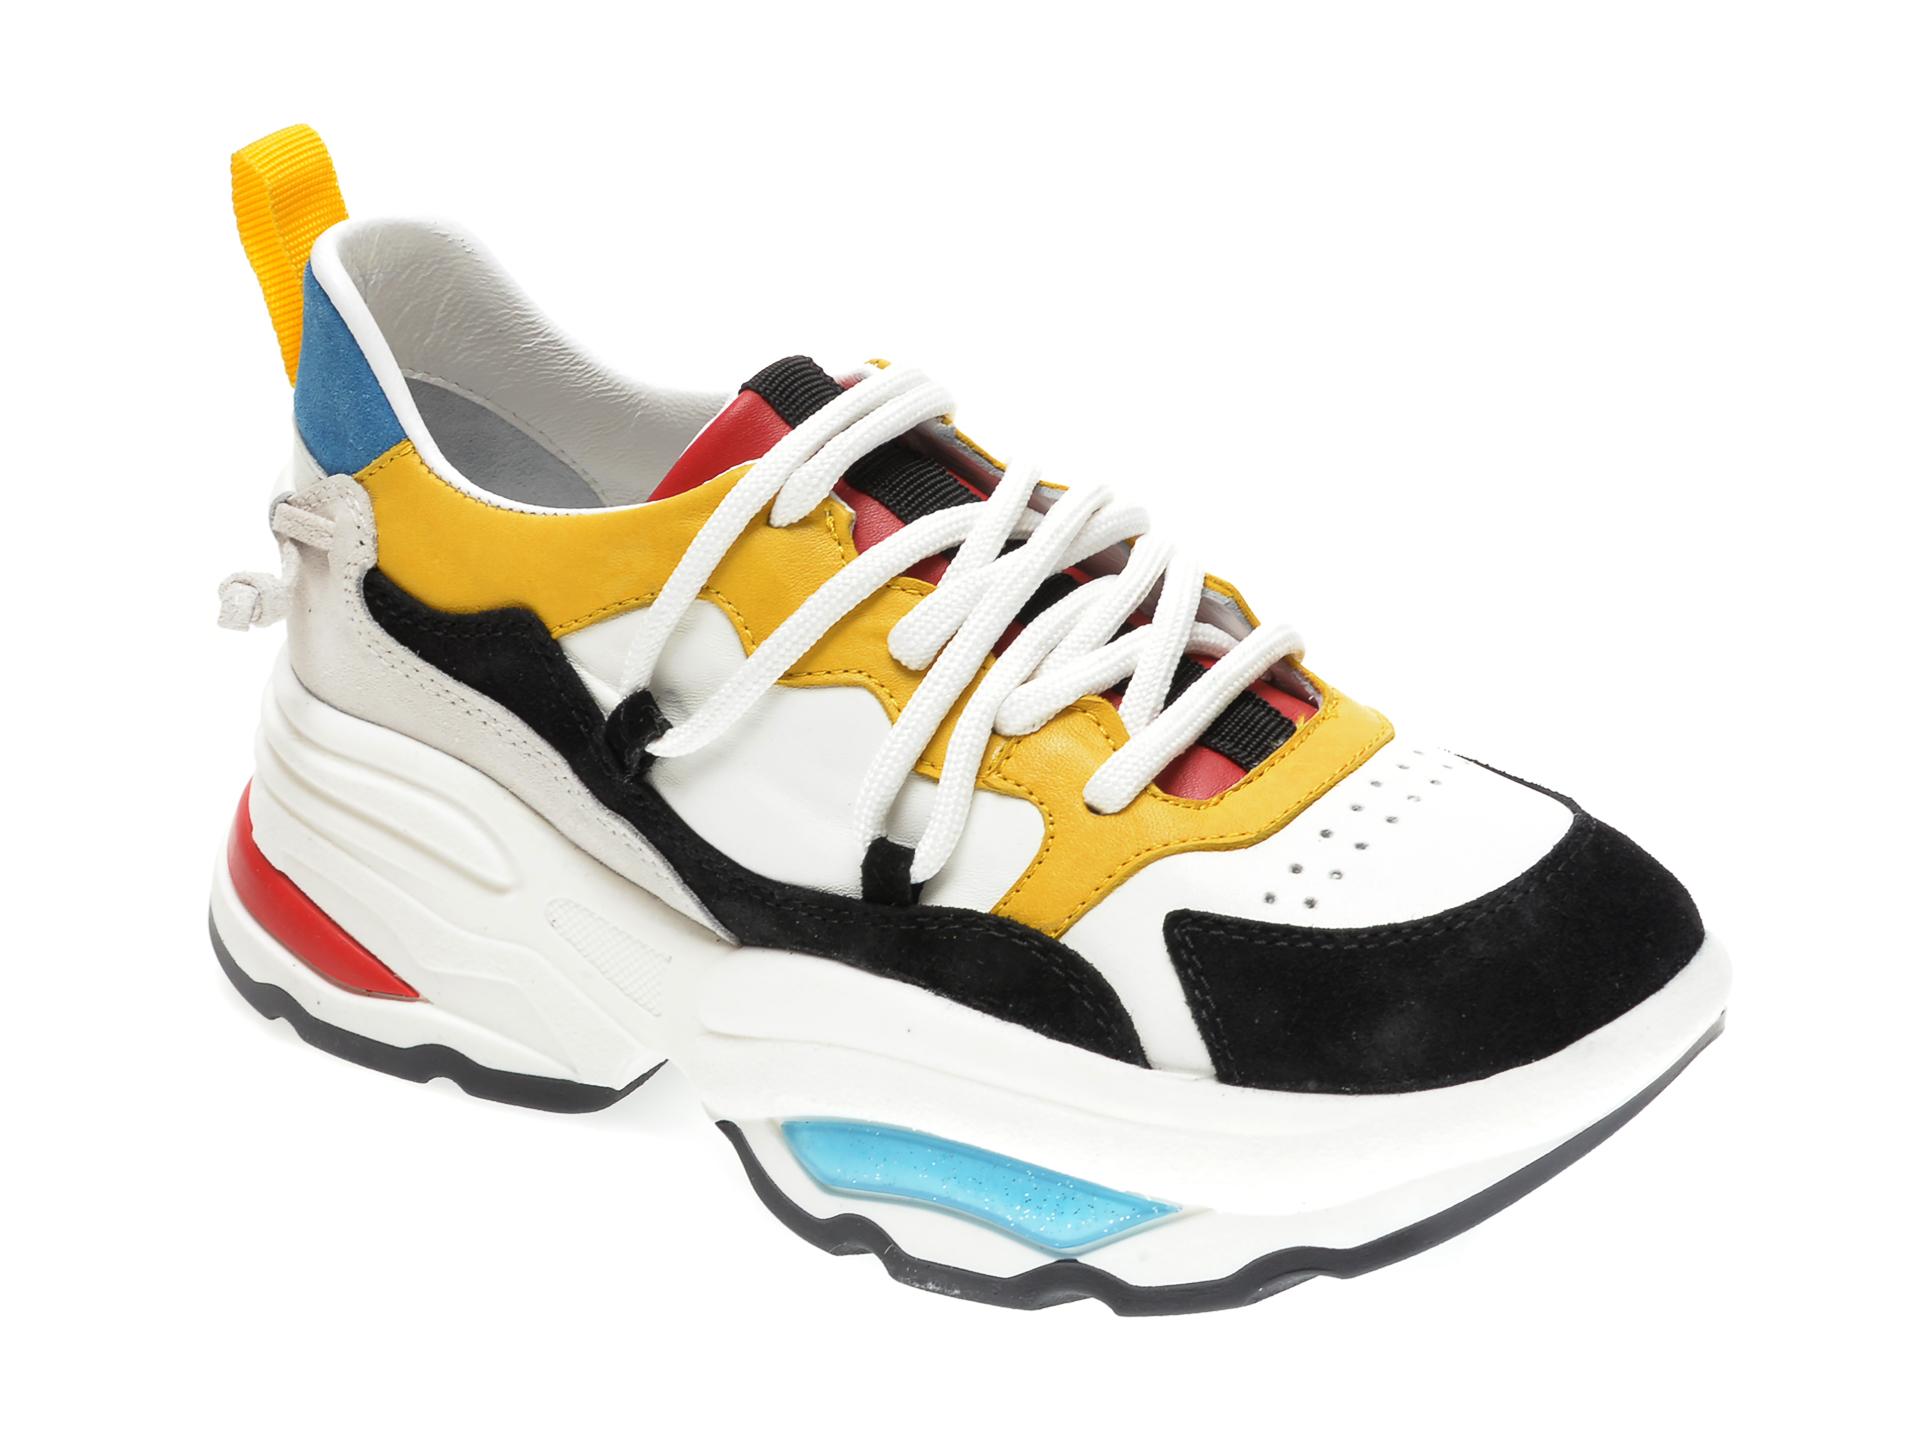 Pantofi sport RADIKAL multicolor, 2653, din piele naturala imagine otter.ro